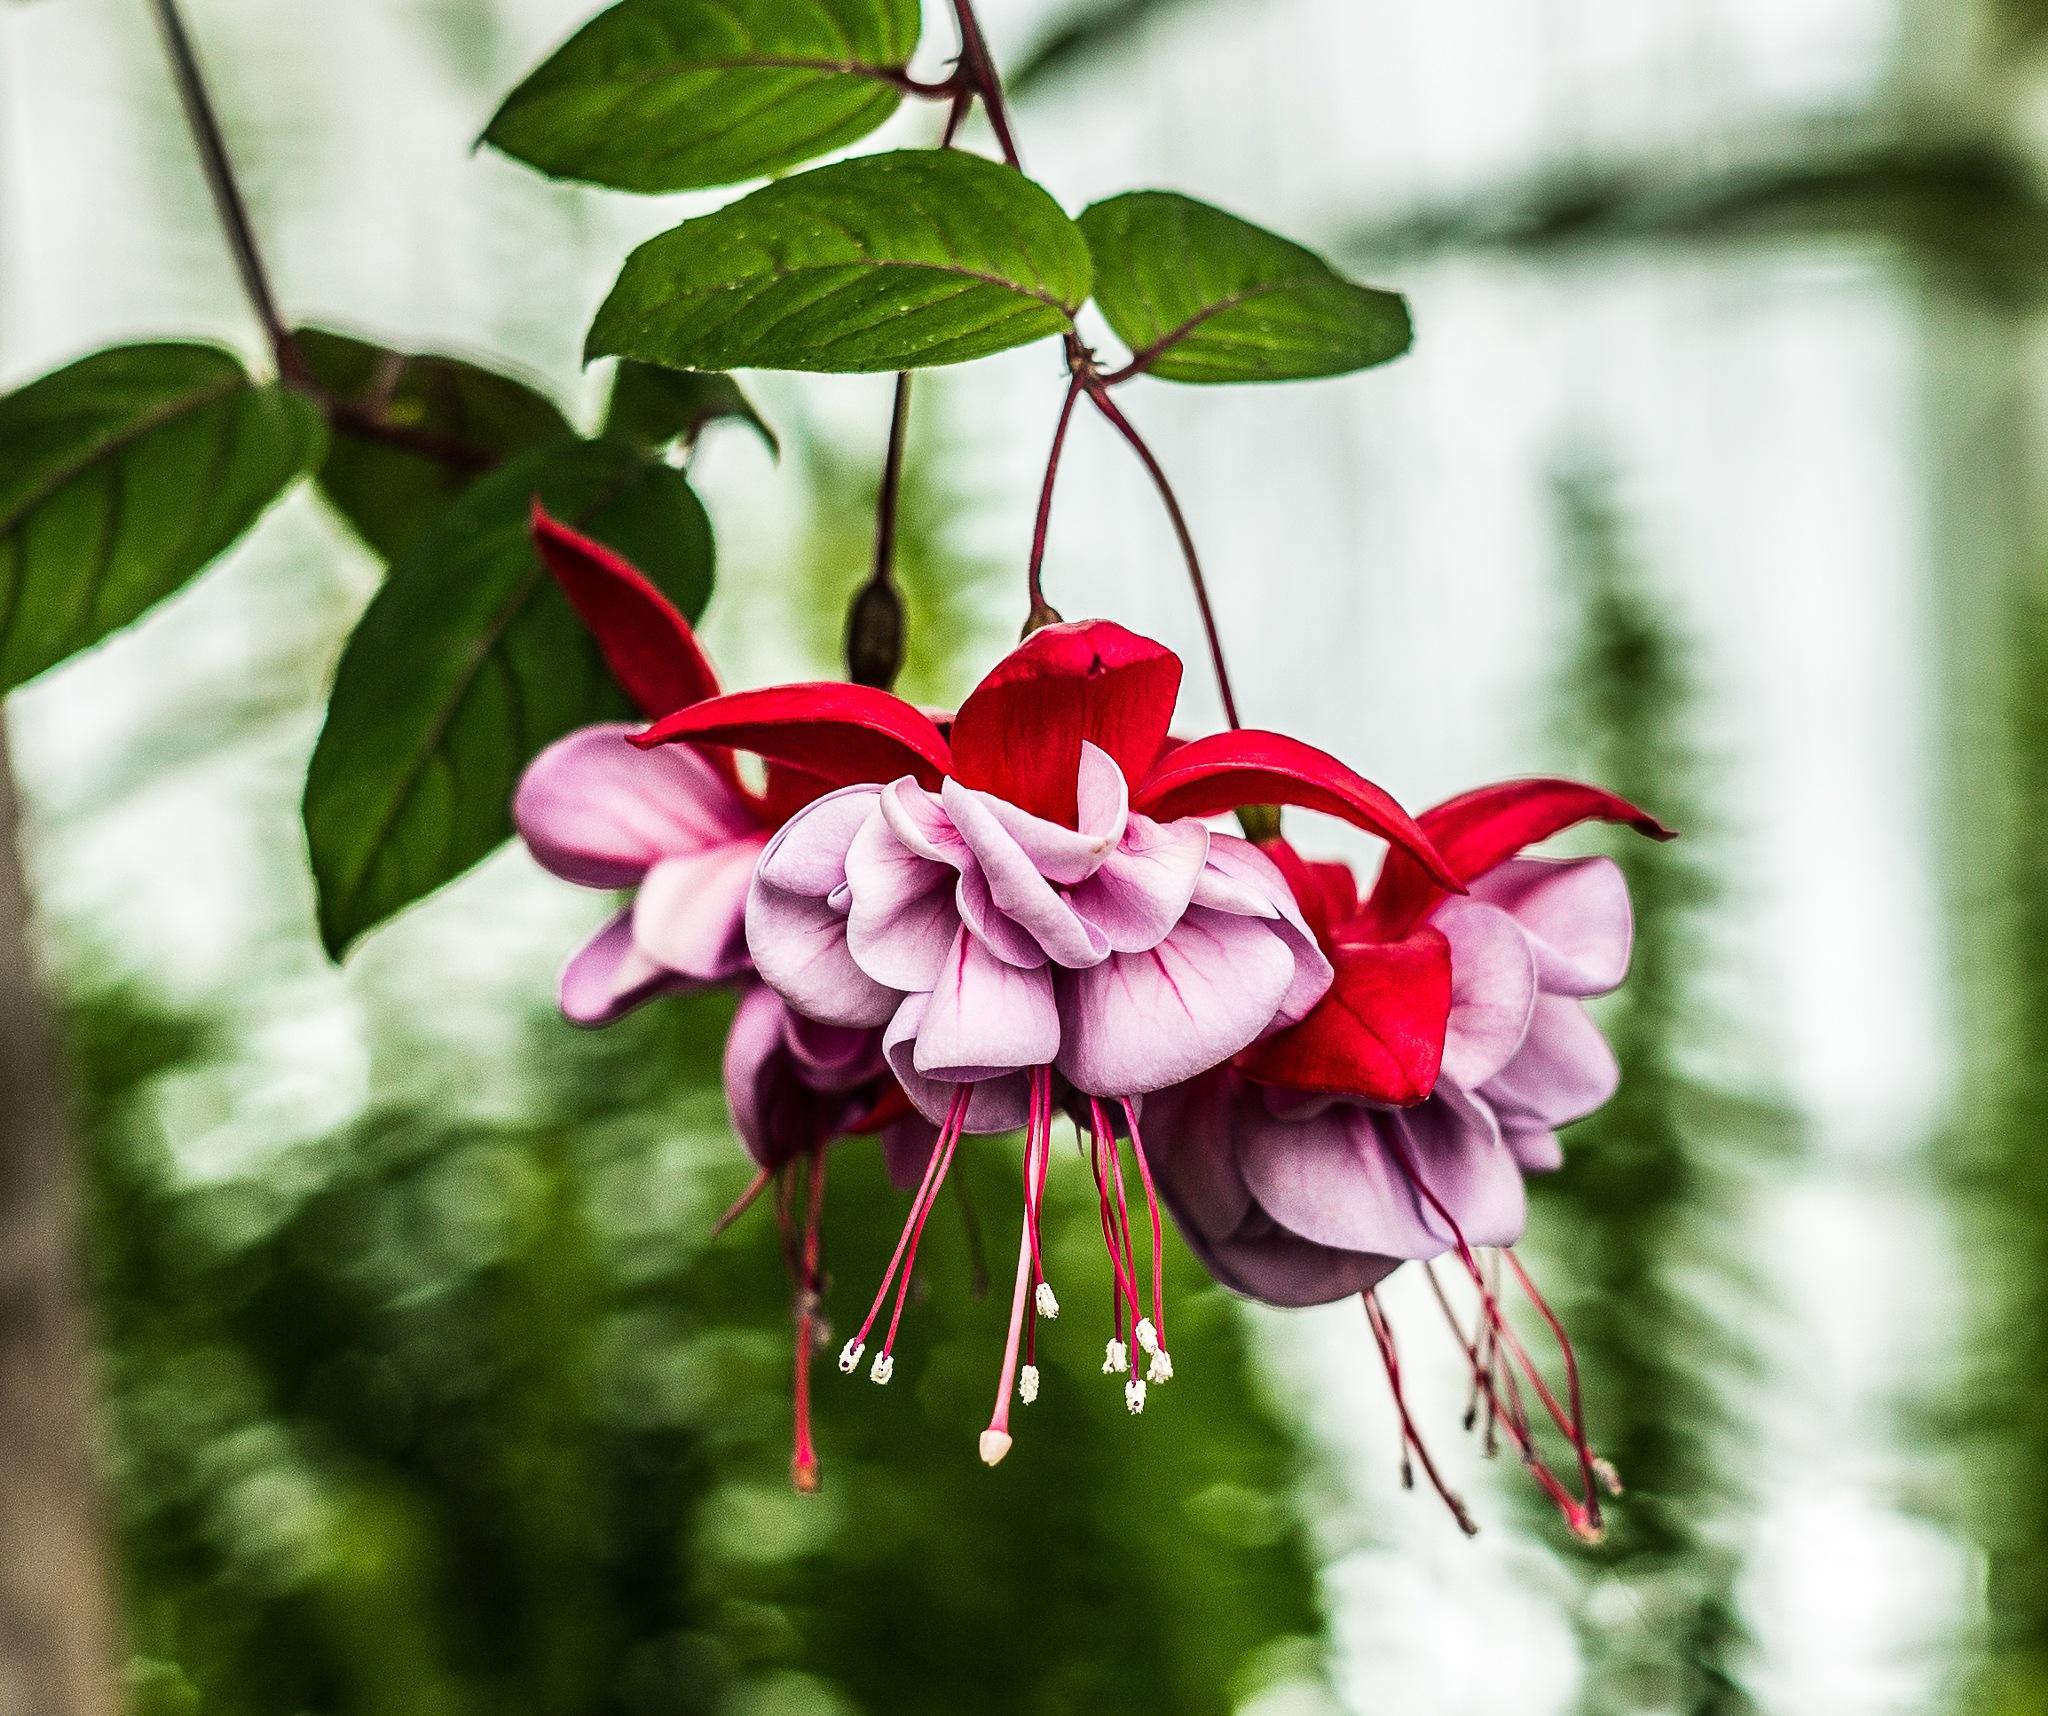 Flower by Stephen C. Benine